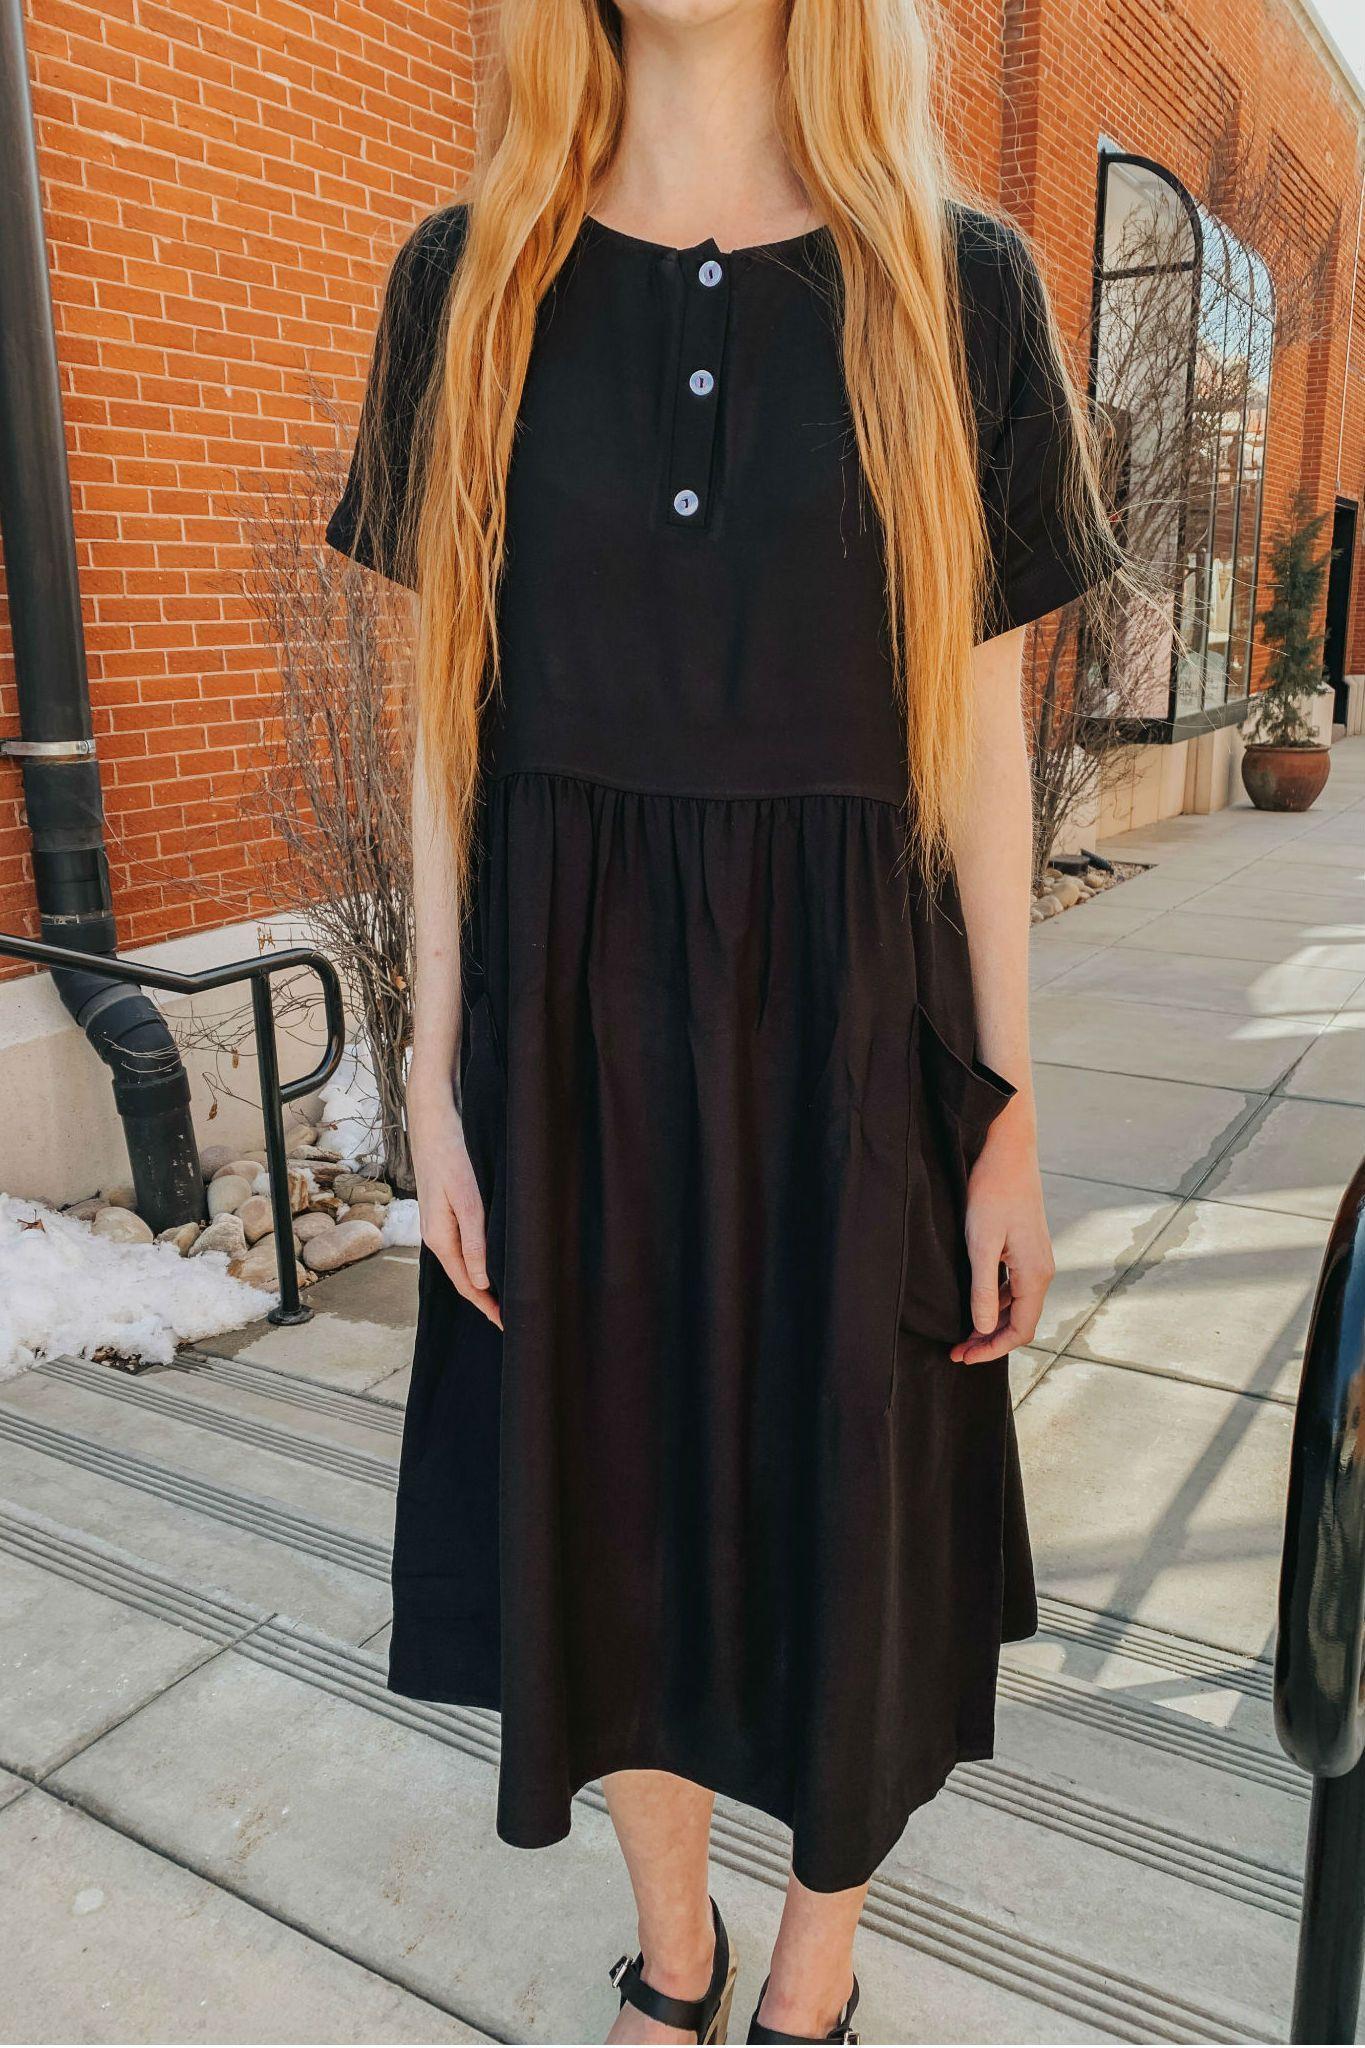 4b6d7ffe4db Ashley Button Dress in Black – CLEO MADISON